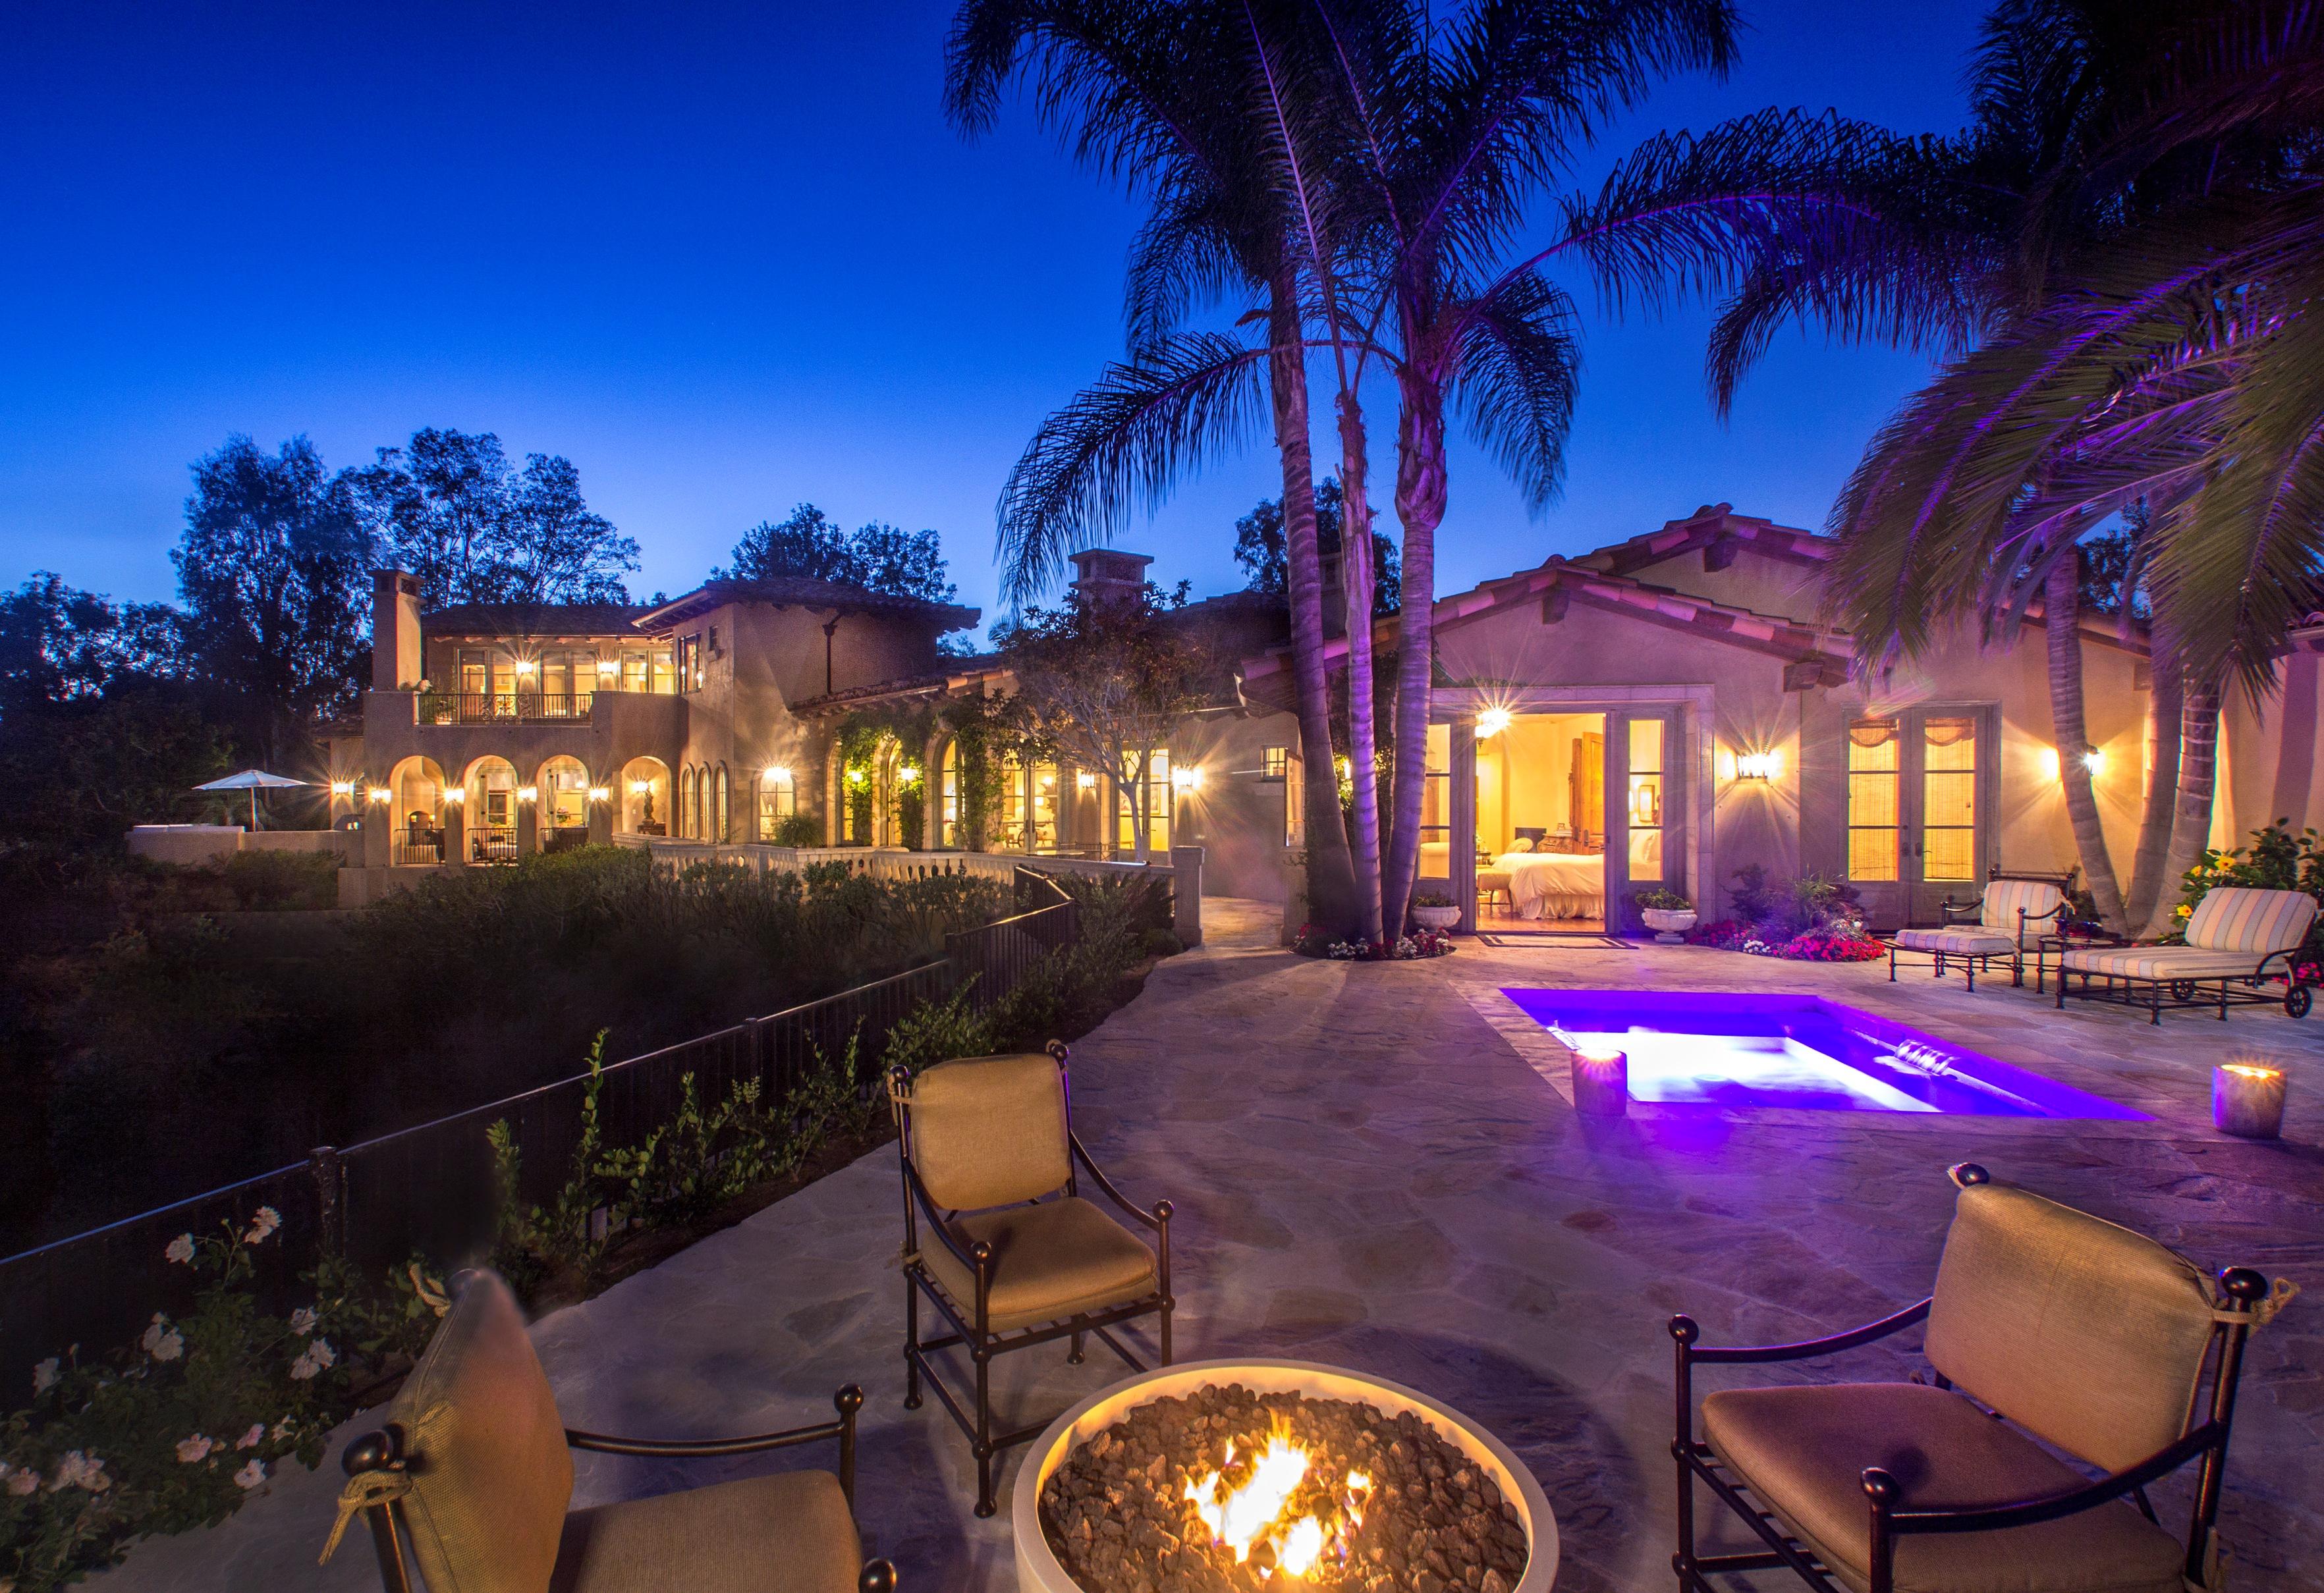 Single Family Home for Sale at 5411 Linea Del Cielo Rancho Santa Fe, California 92067 United States